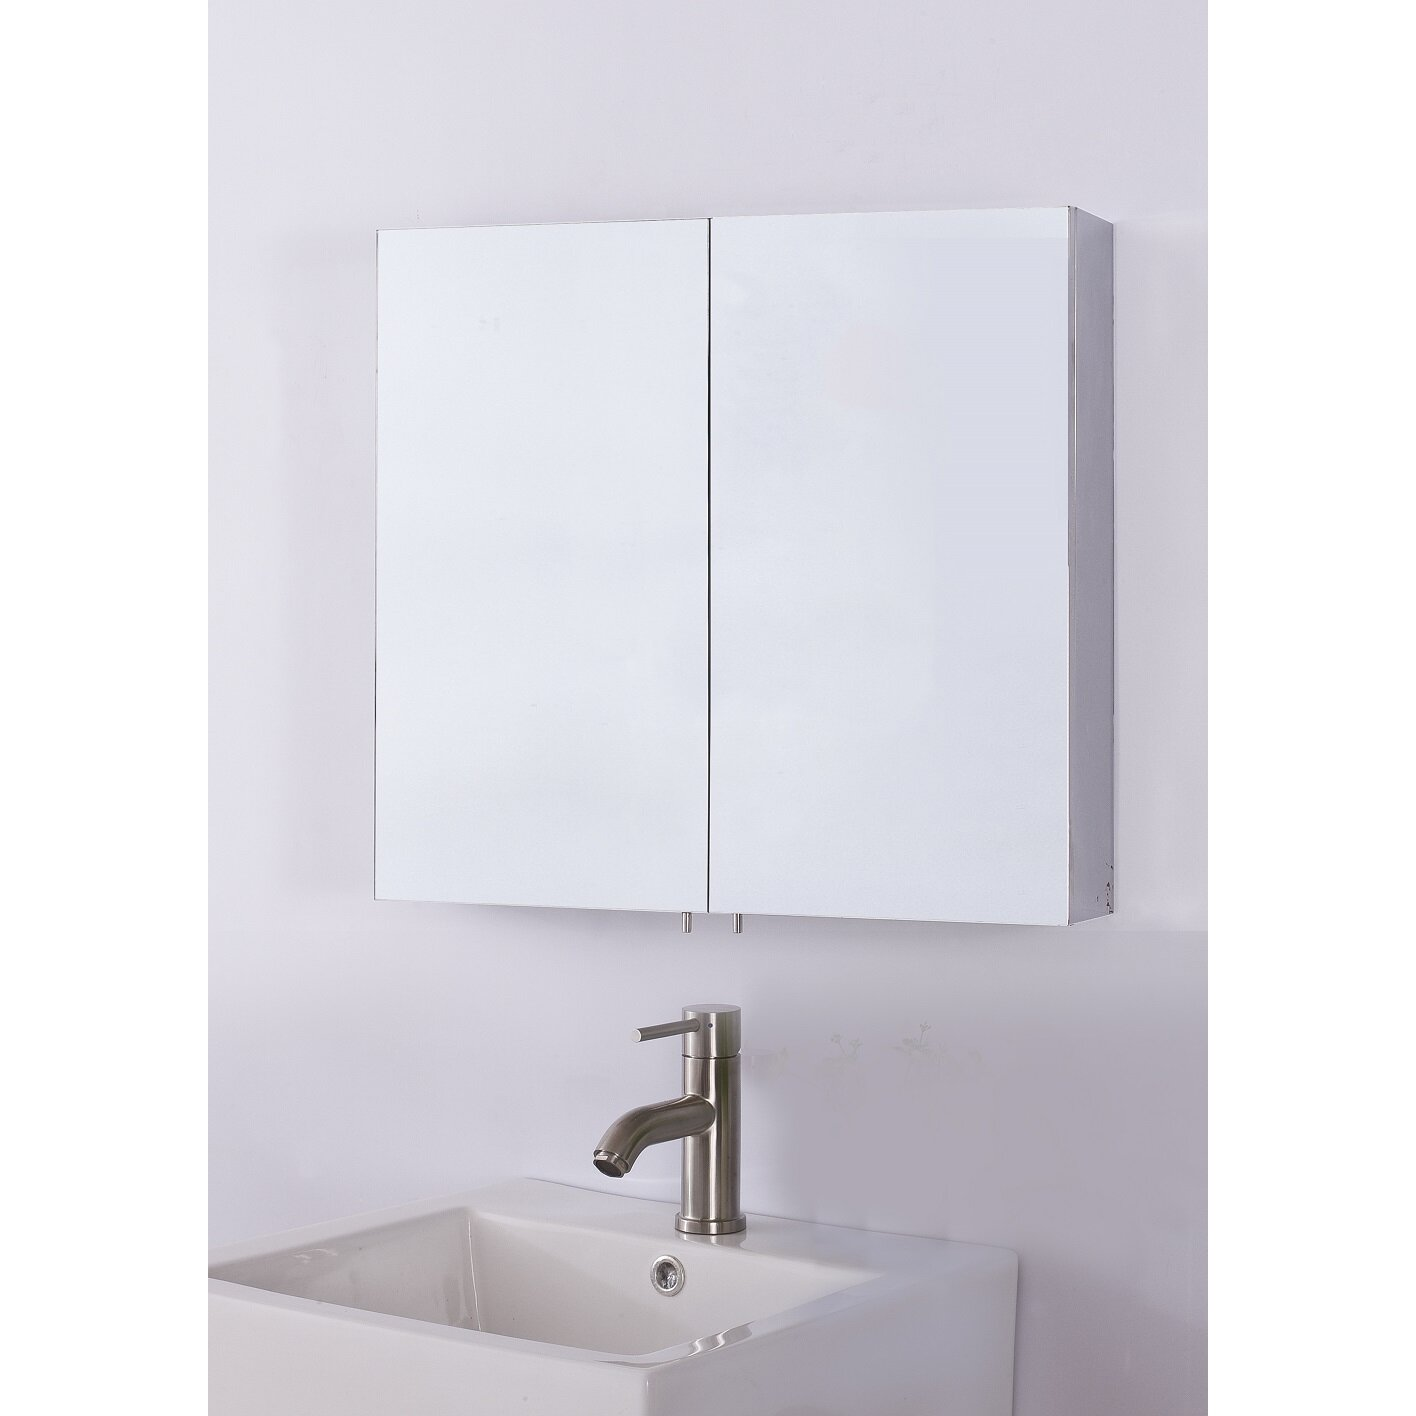 Bathroom medicine cabinets recessed - 23 6 X 22 Recessed Or Surface Mount Medicine Cabinet